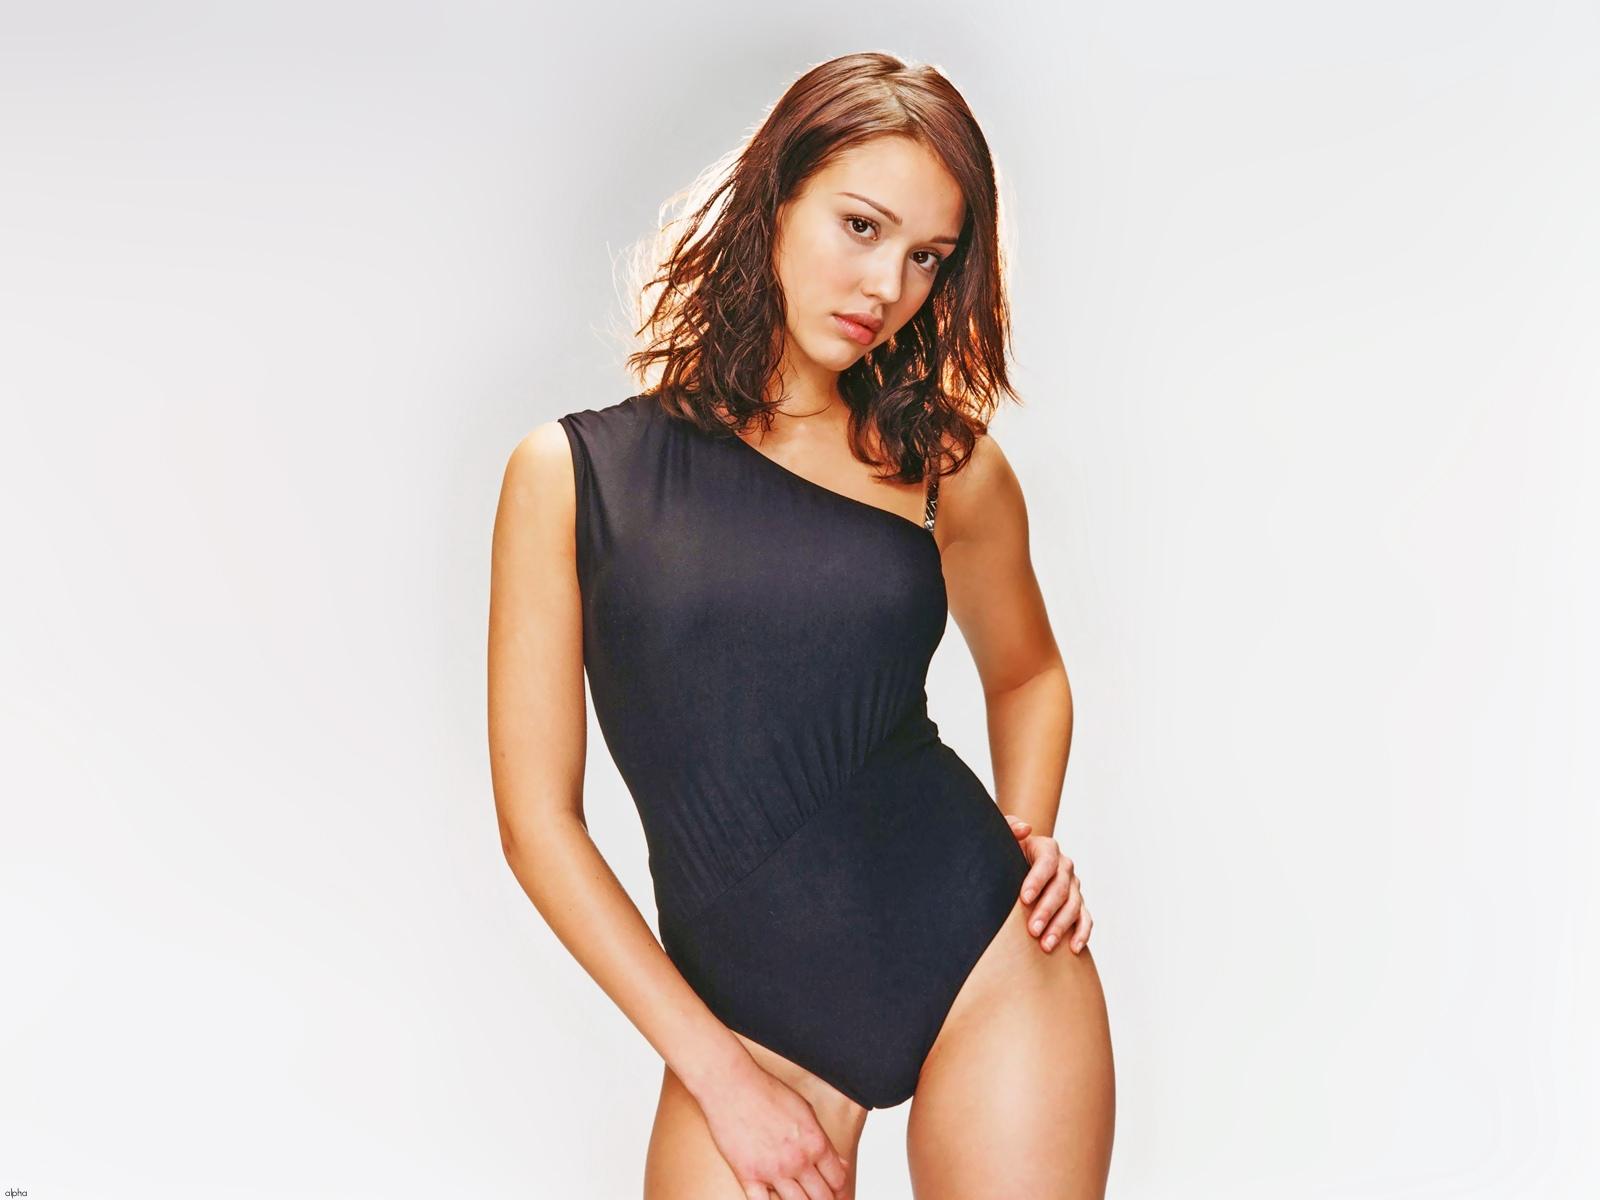 http://4.bp.blogspot.com/-St8Pb8Yzxsc/Tghi38lGnFI/AAAAAAAAJVI/ols-fmA6P6k/s1600/sploogeblog_jessica_alba_swimsuit_wallpaper.jpg